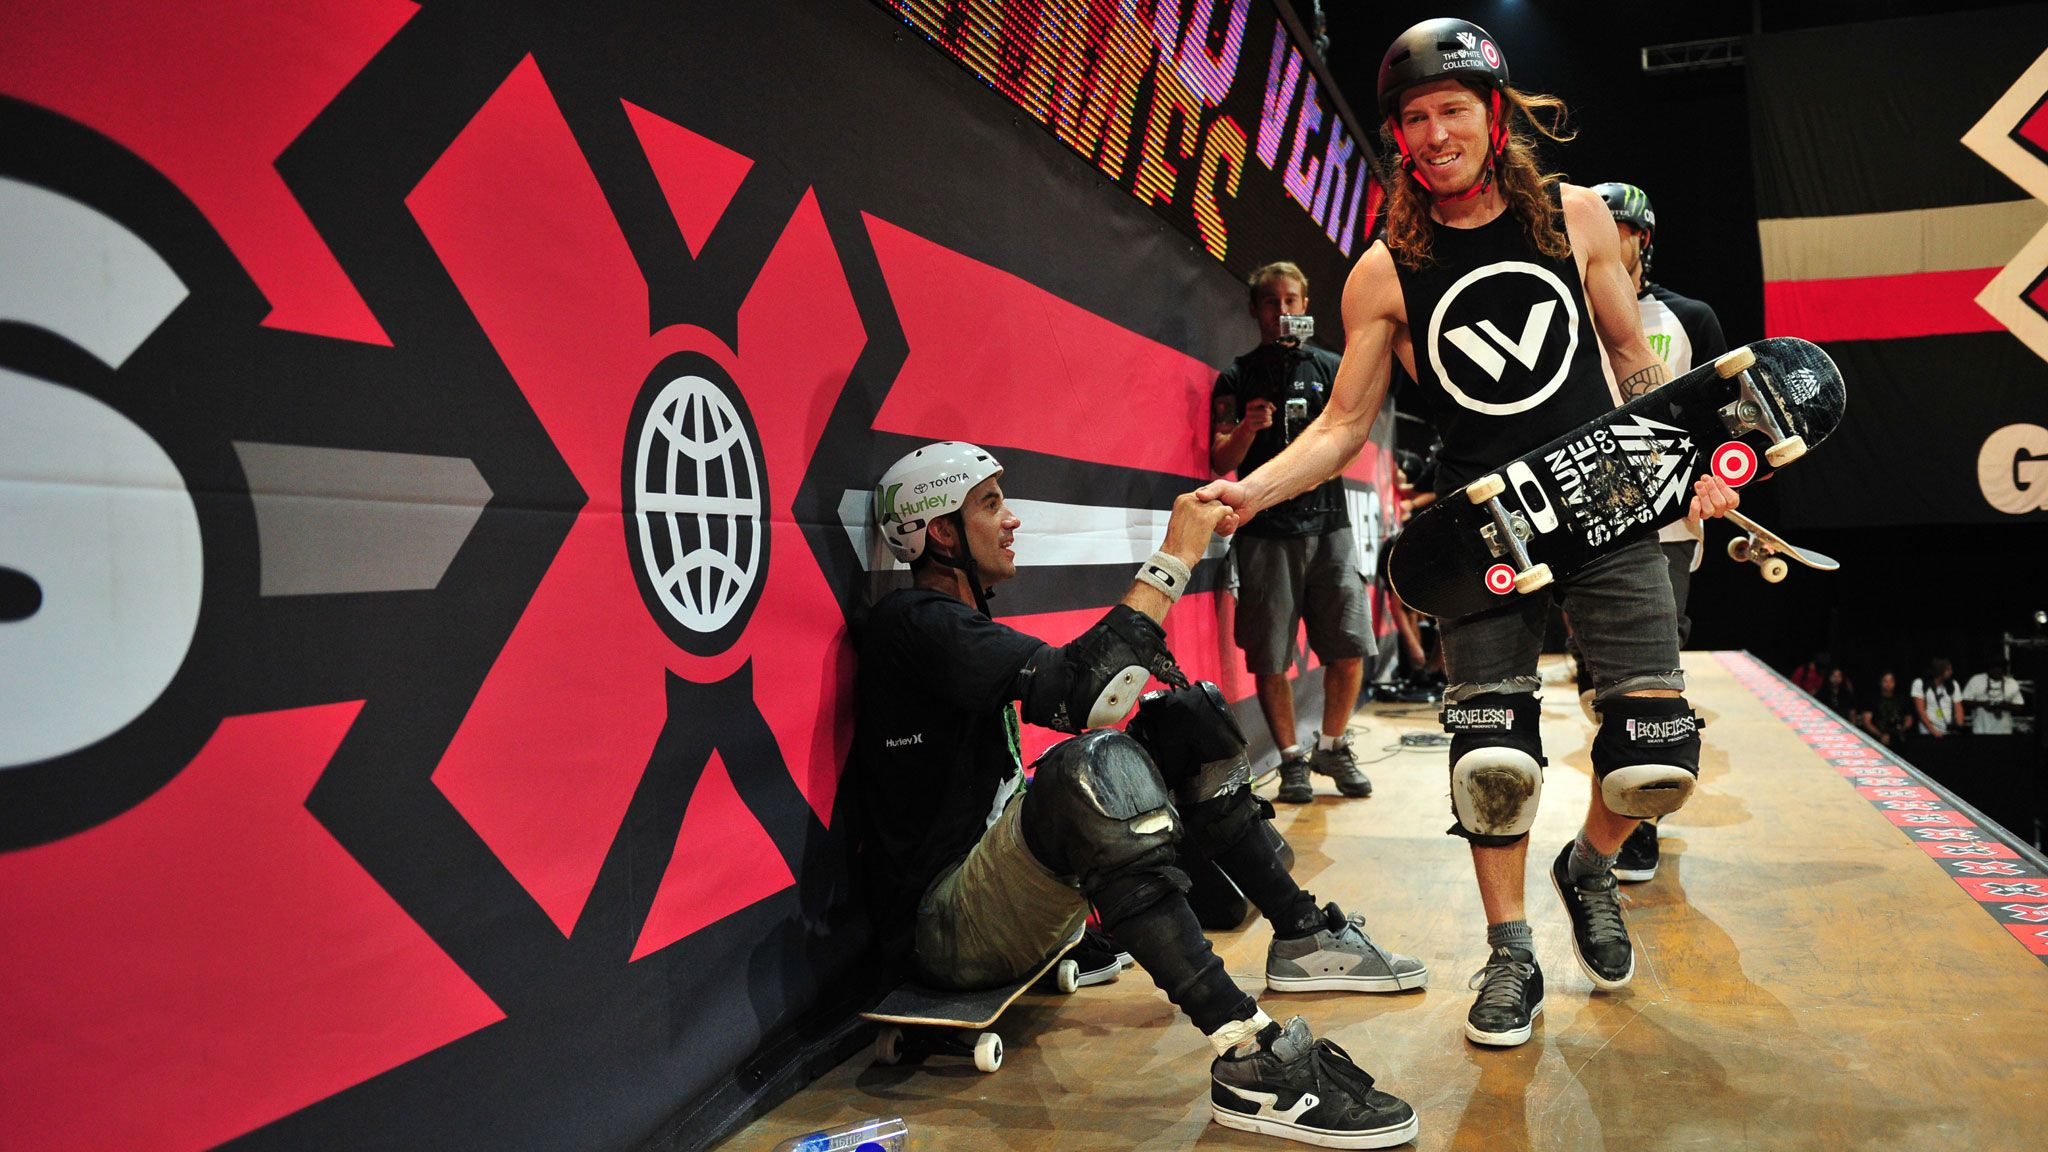 Roller skating x games - Skateboarding